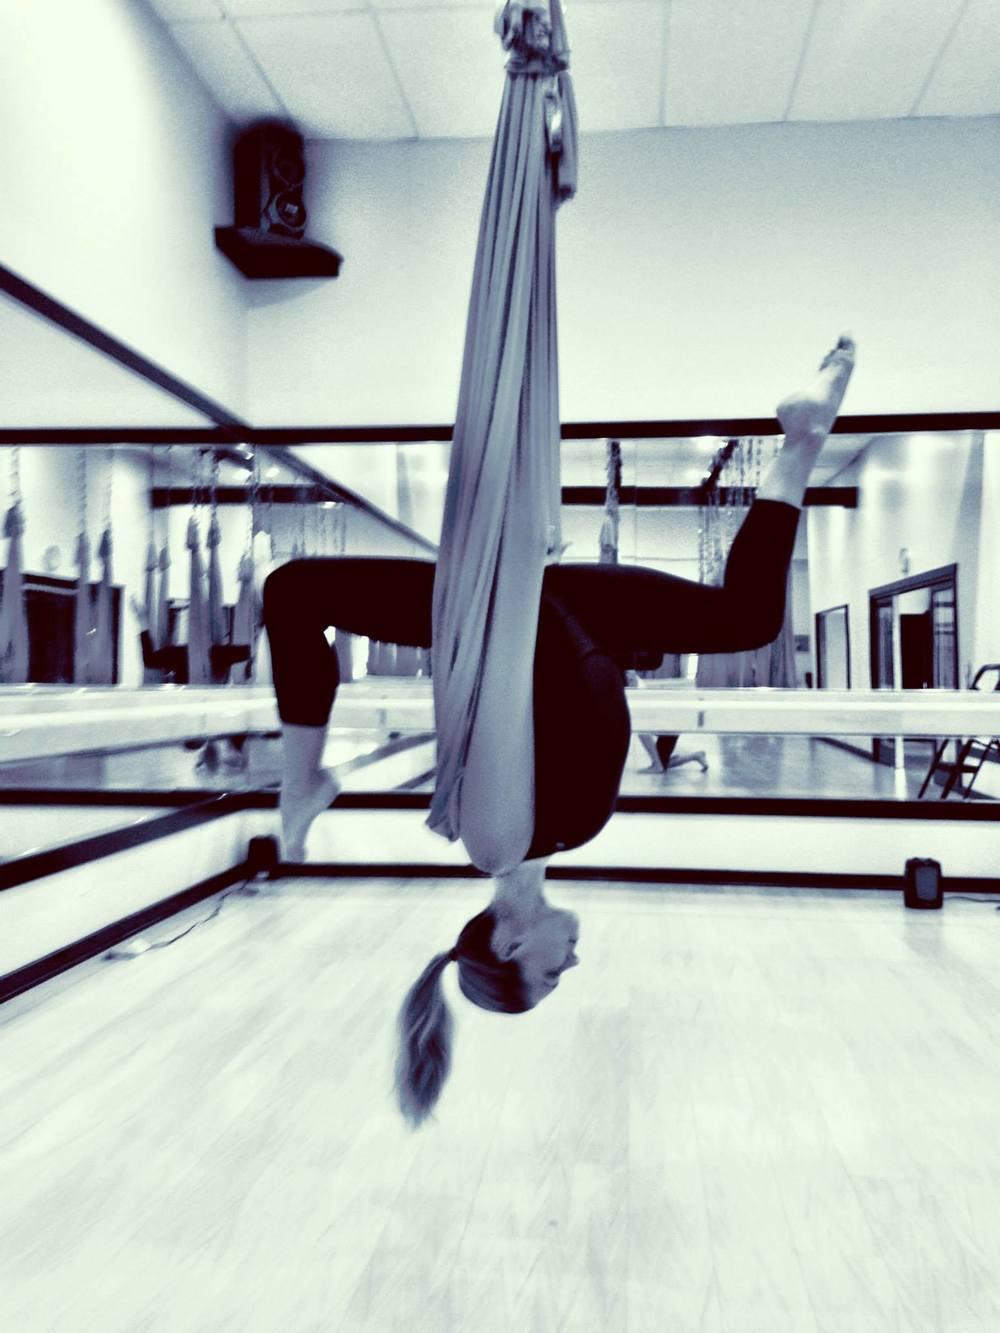 24 August 2013. Calabasas, CA. Anti-gravity fitness.